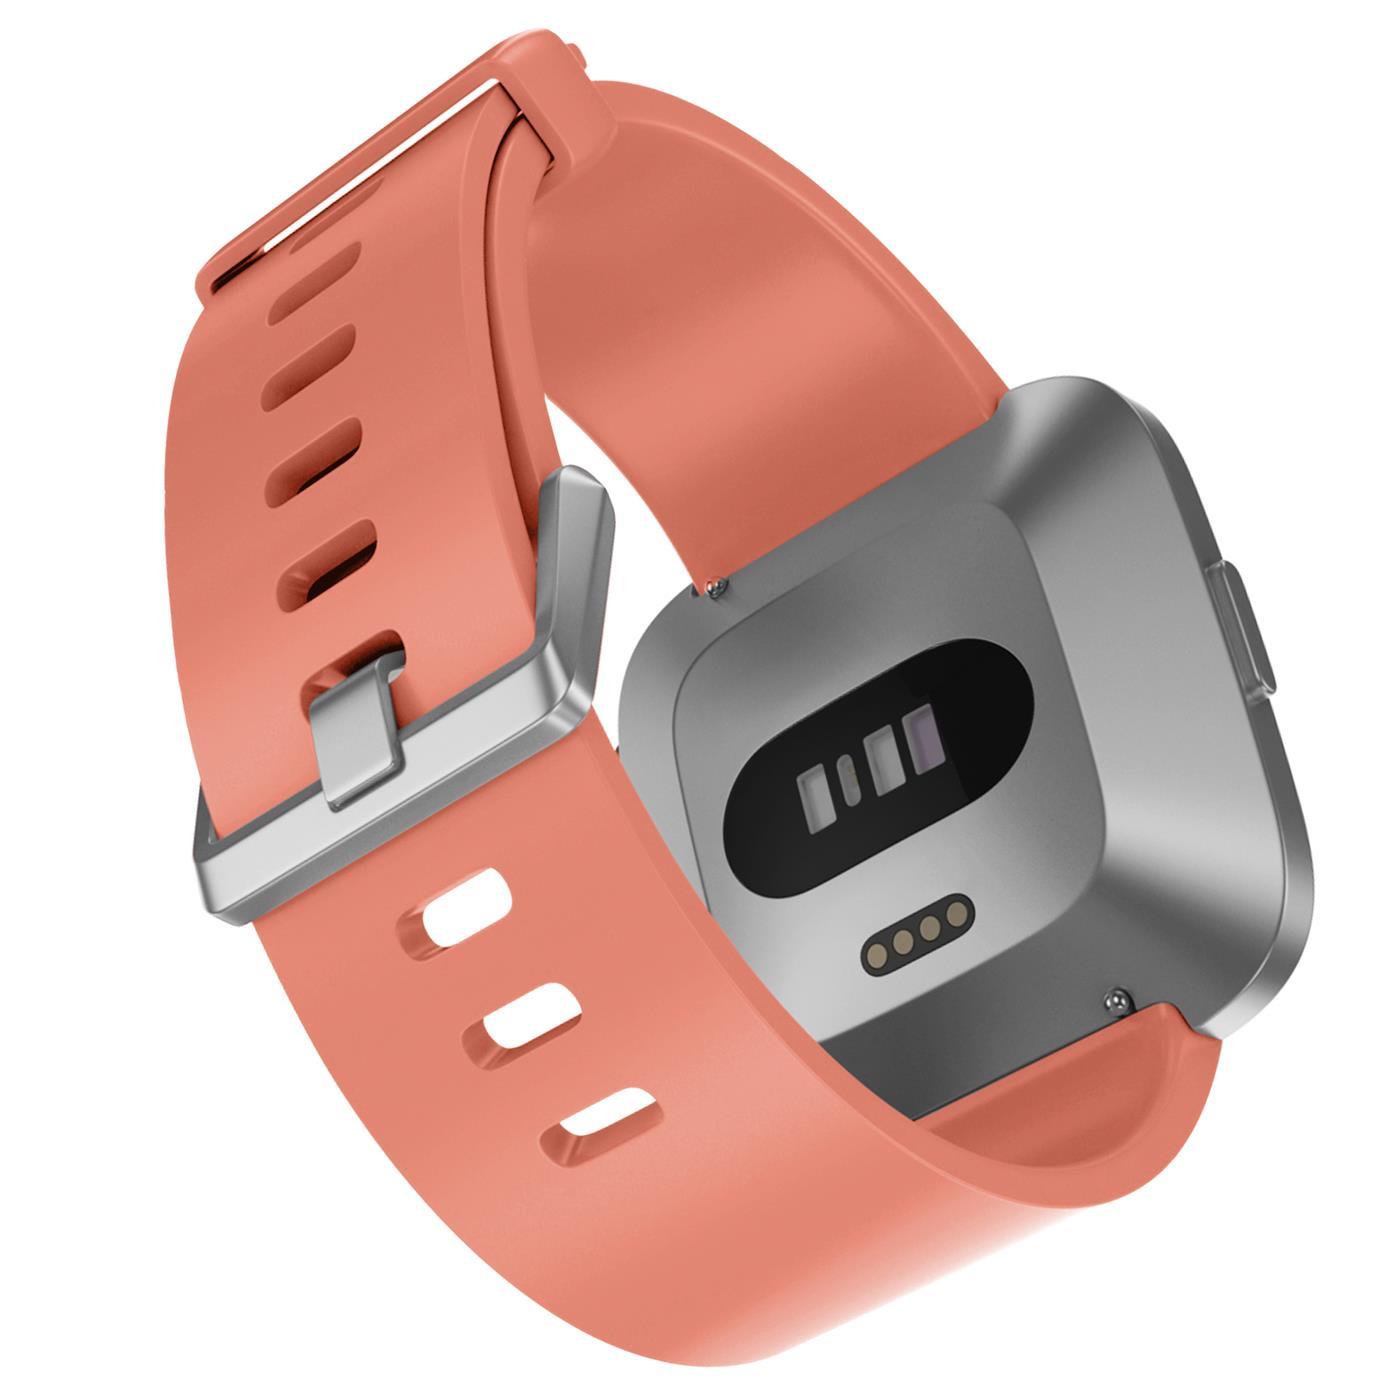 Fitbit-Groesse-S-oder-L-Ersatz-Silikon-Armband-Uhren-Sport-Band-Fitness-Tracker Indexbild 36